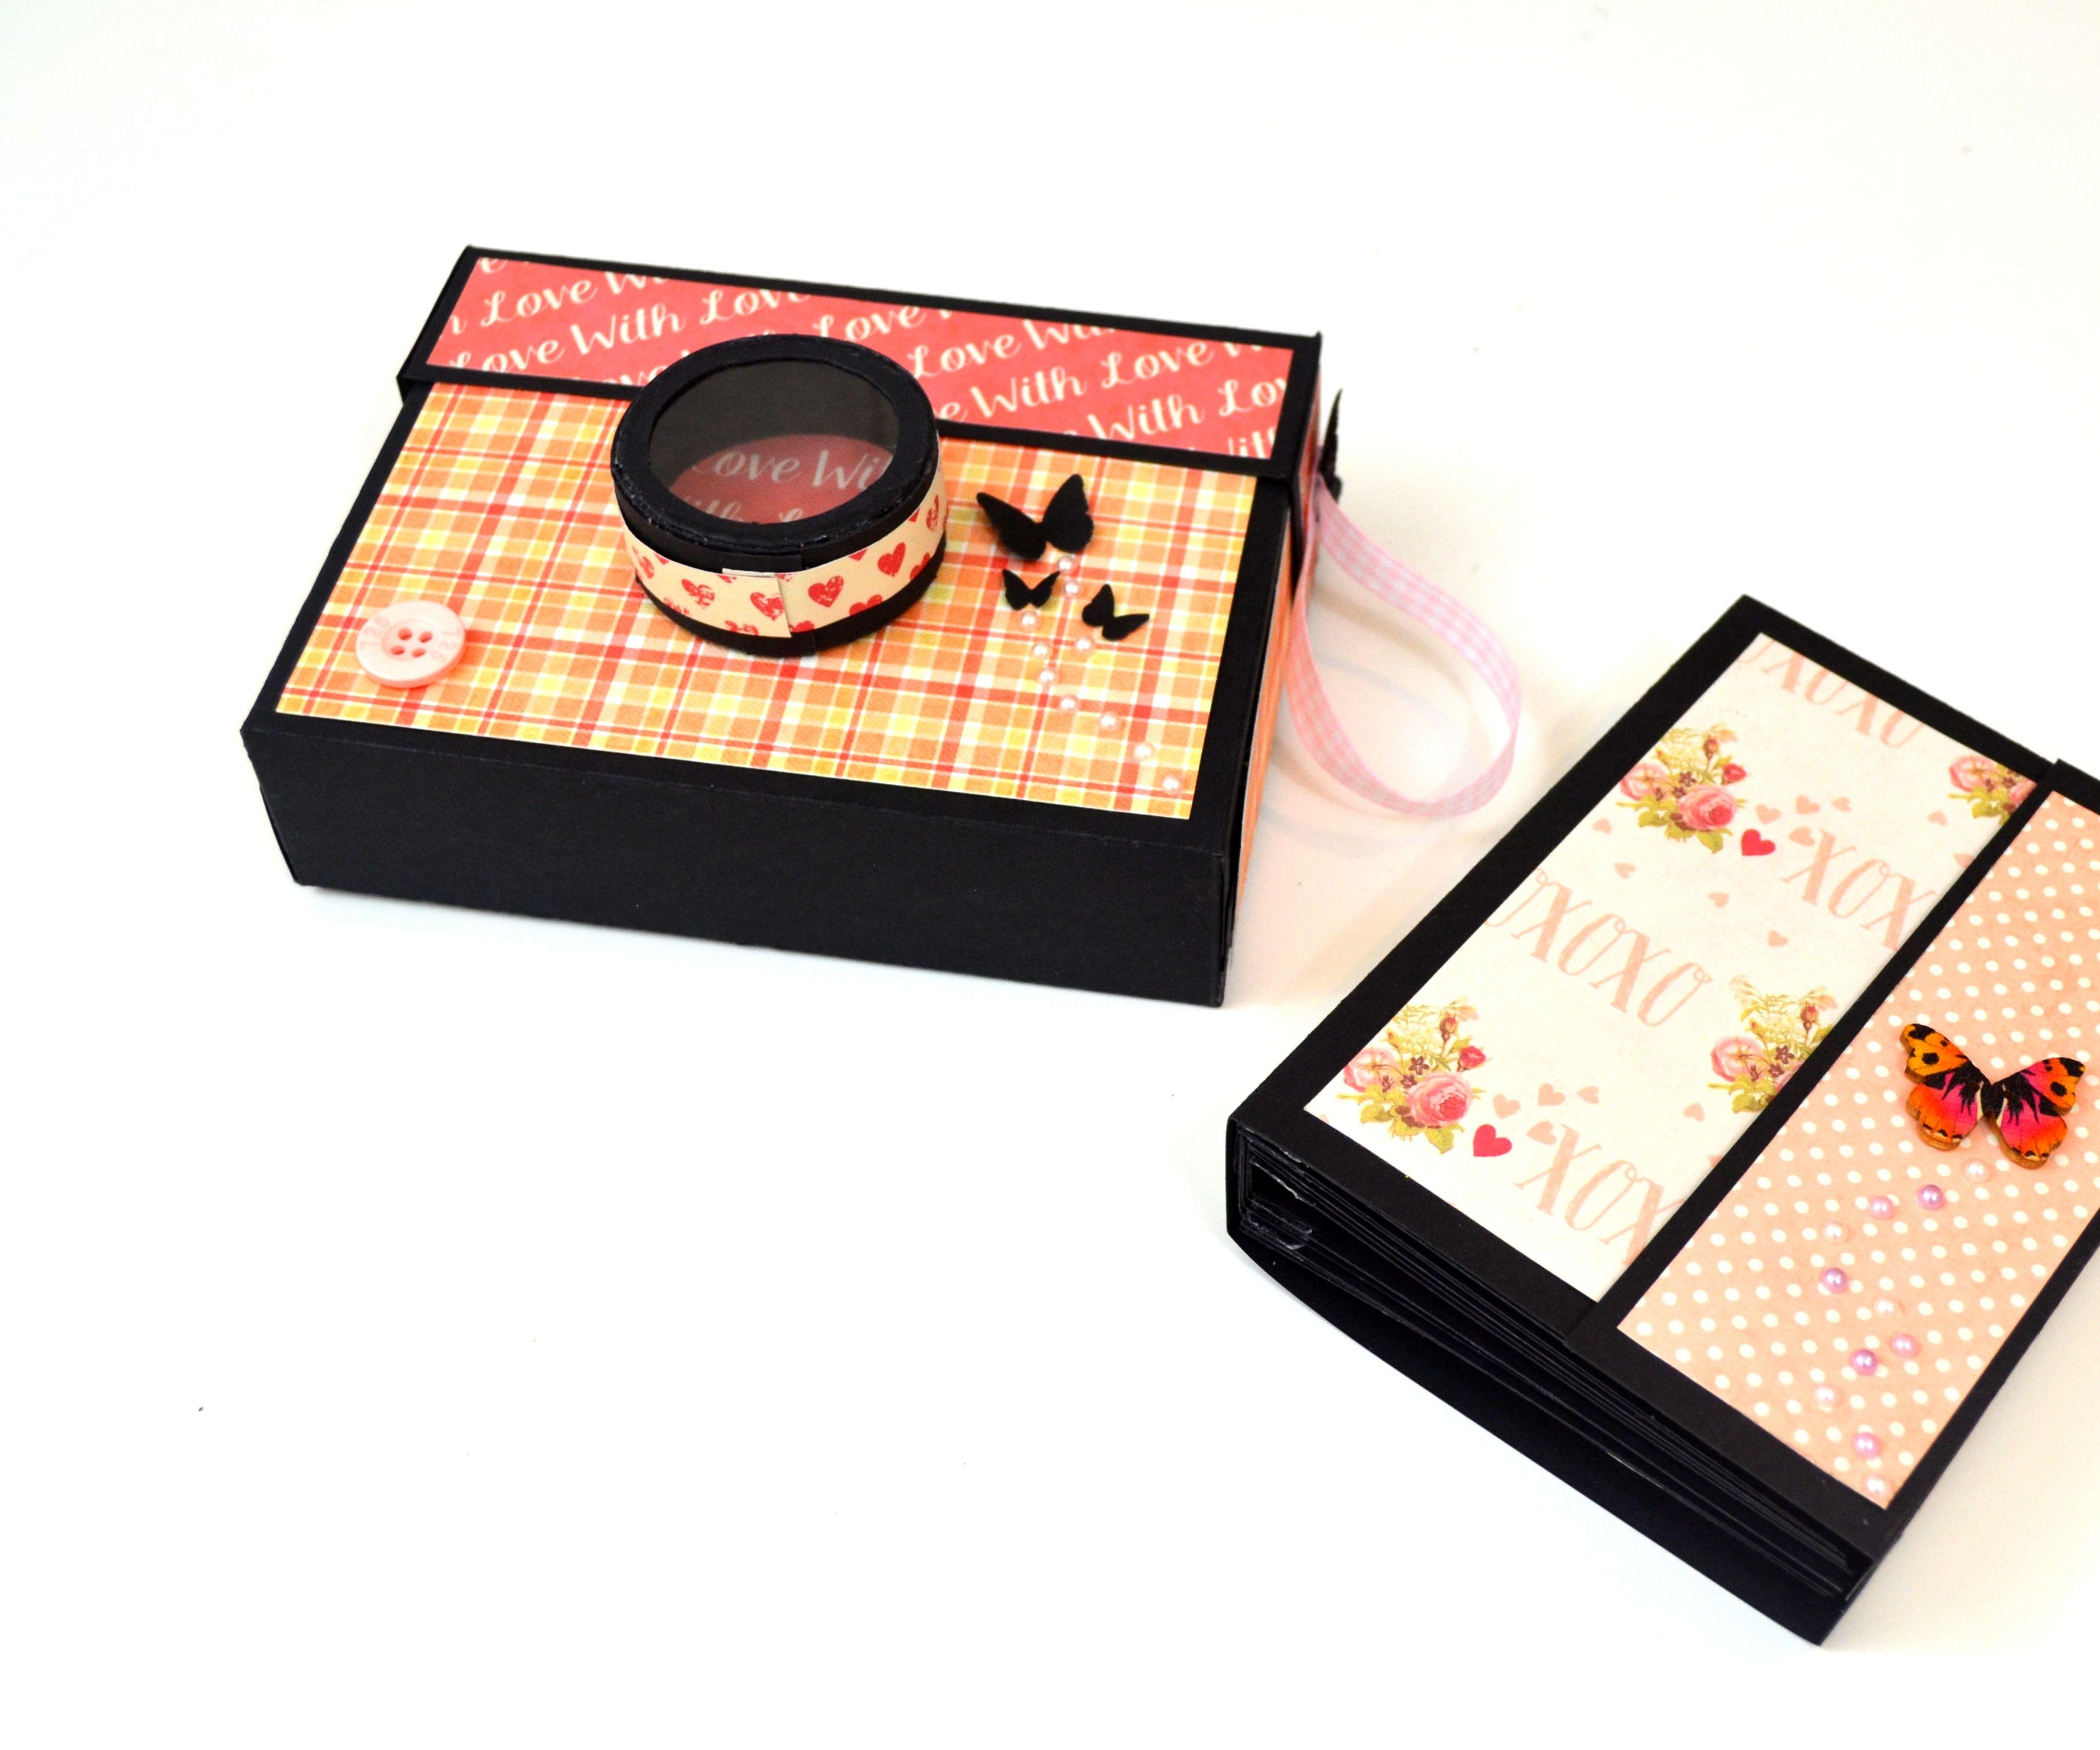 DIY Paper Crafts - How to Make a Photo Mini Album - Valentine's Day Gift Idea